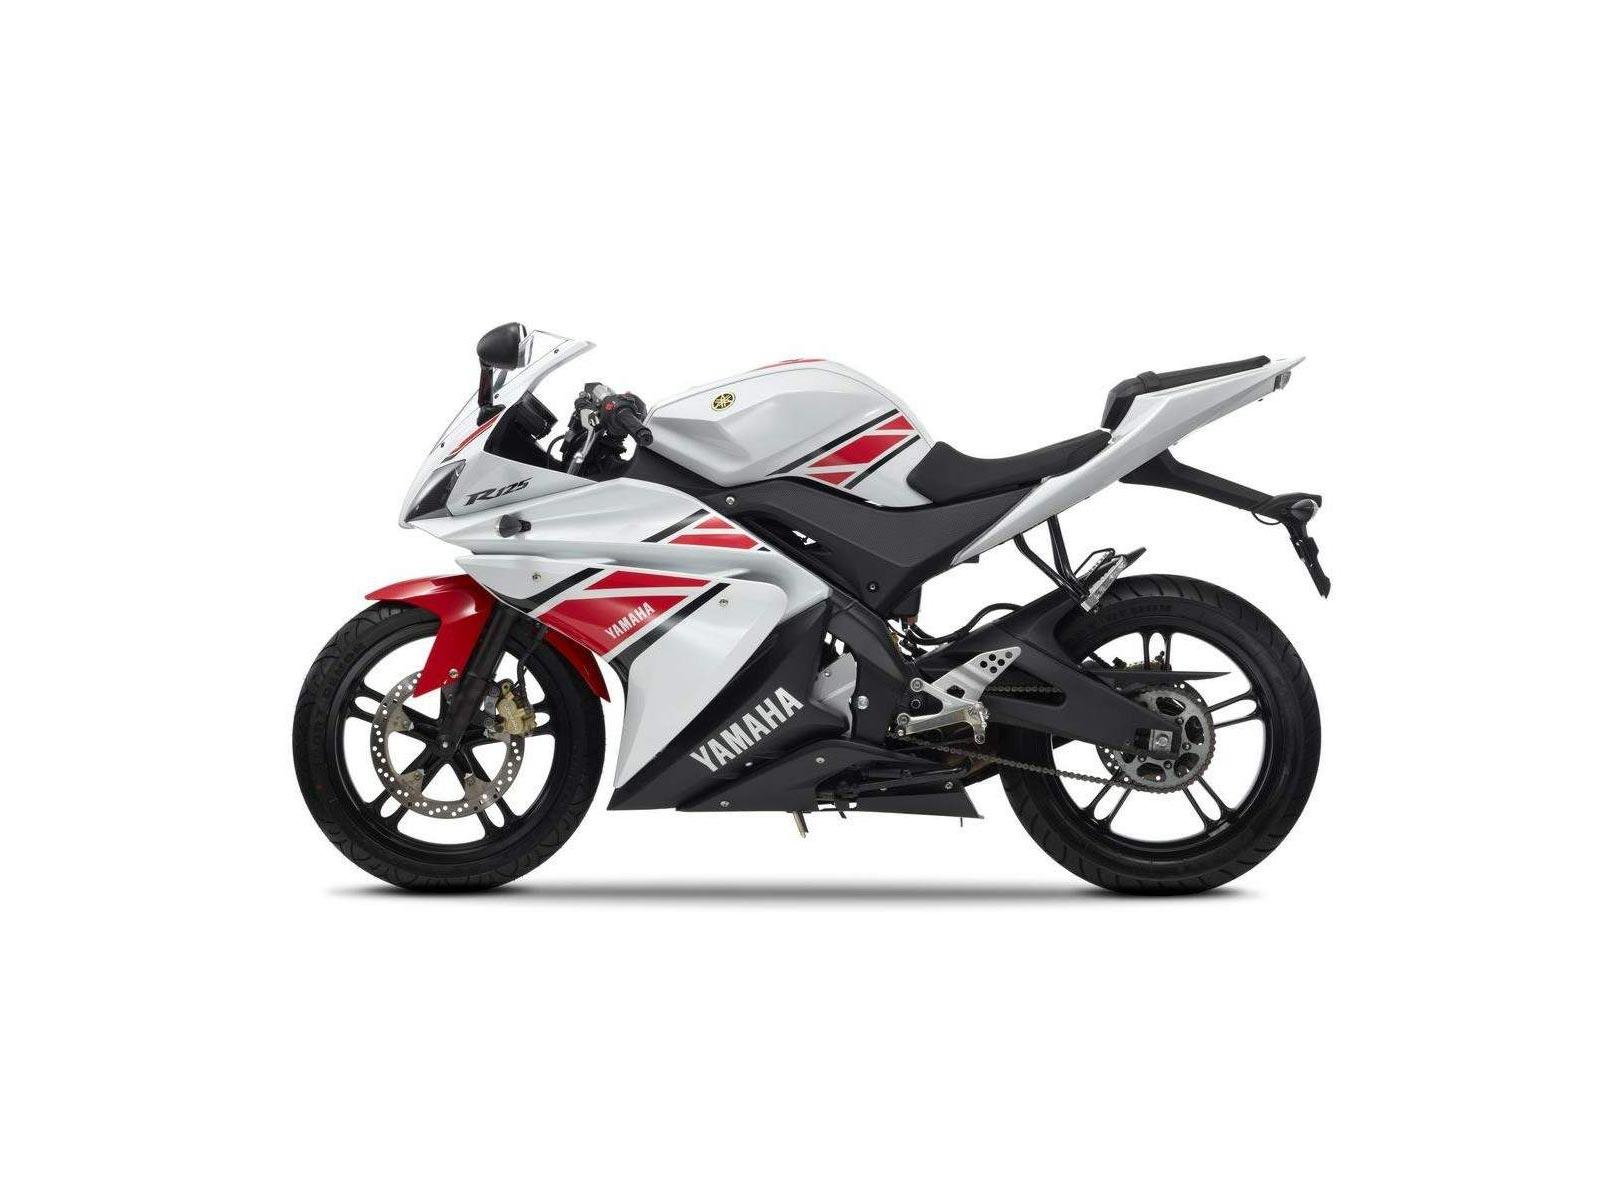 Yamaha 250cc sport bike confirmed for india asphalt rubber for Cycle sport yamaha